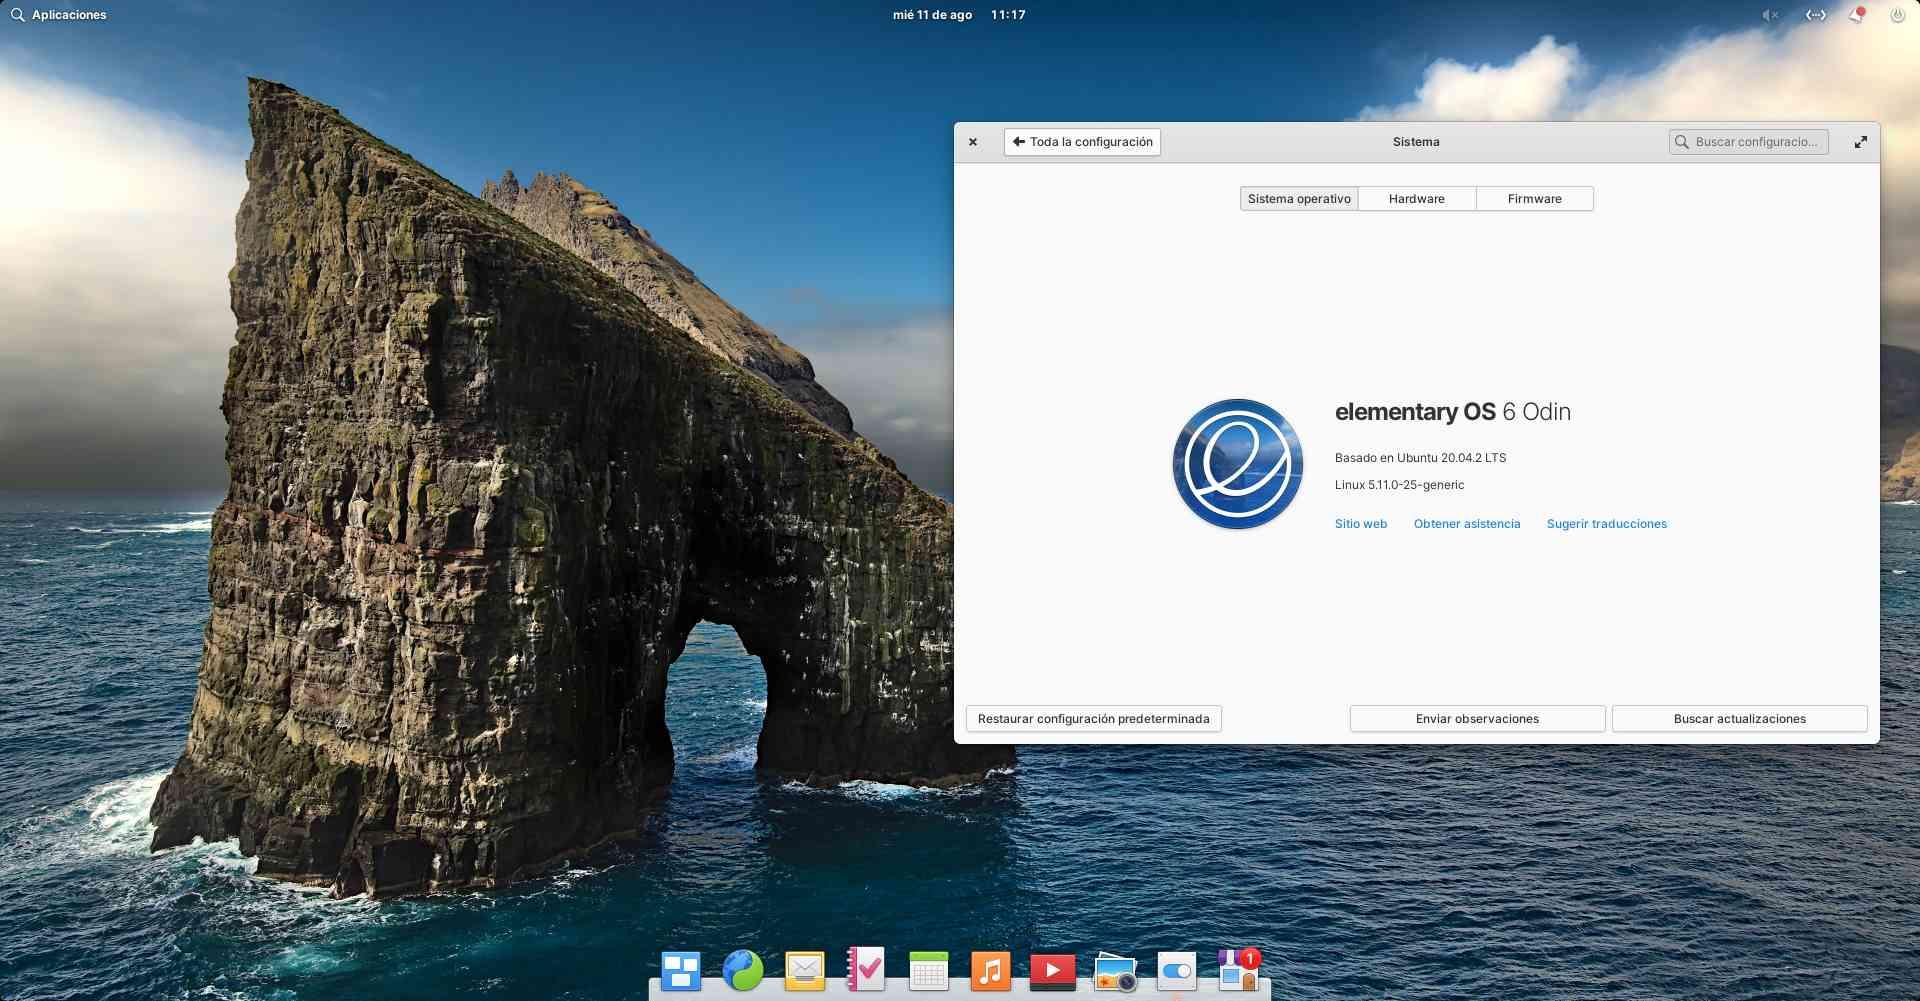 elementary OS 6